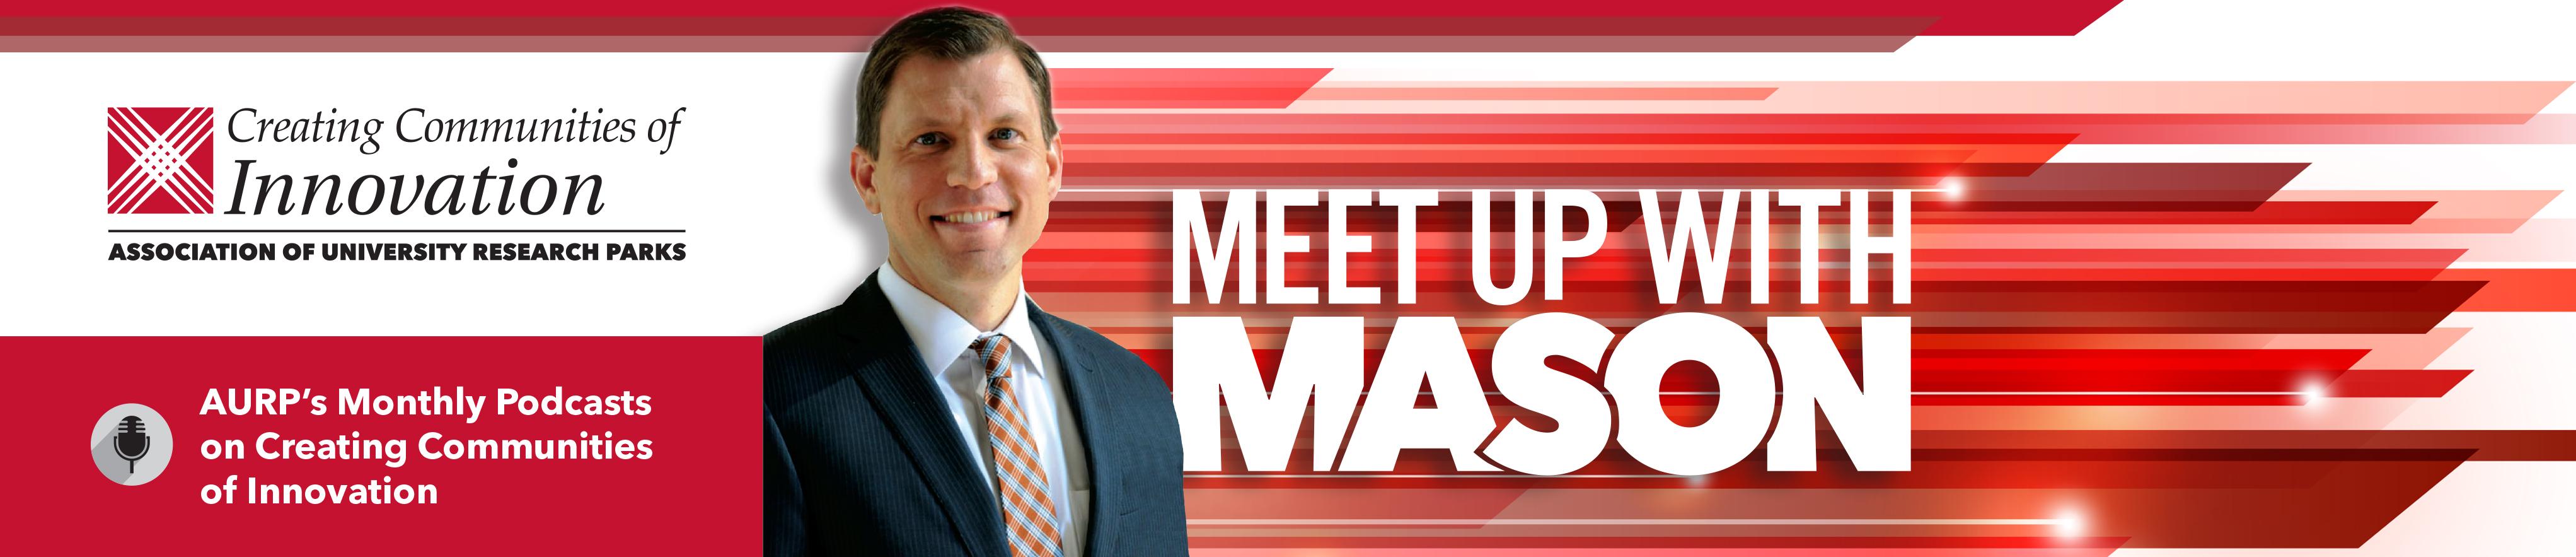 Meet Up with Mason